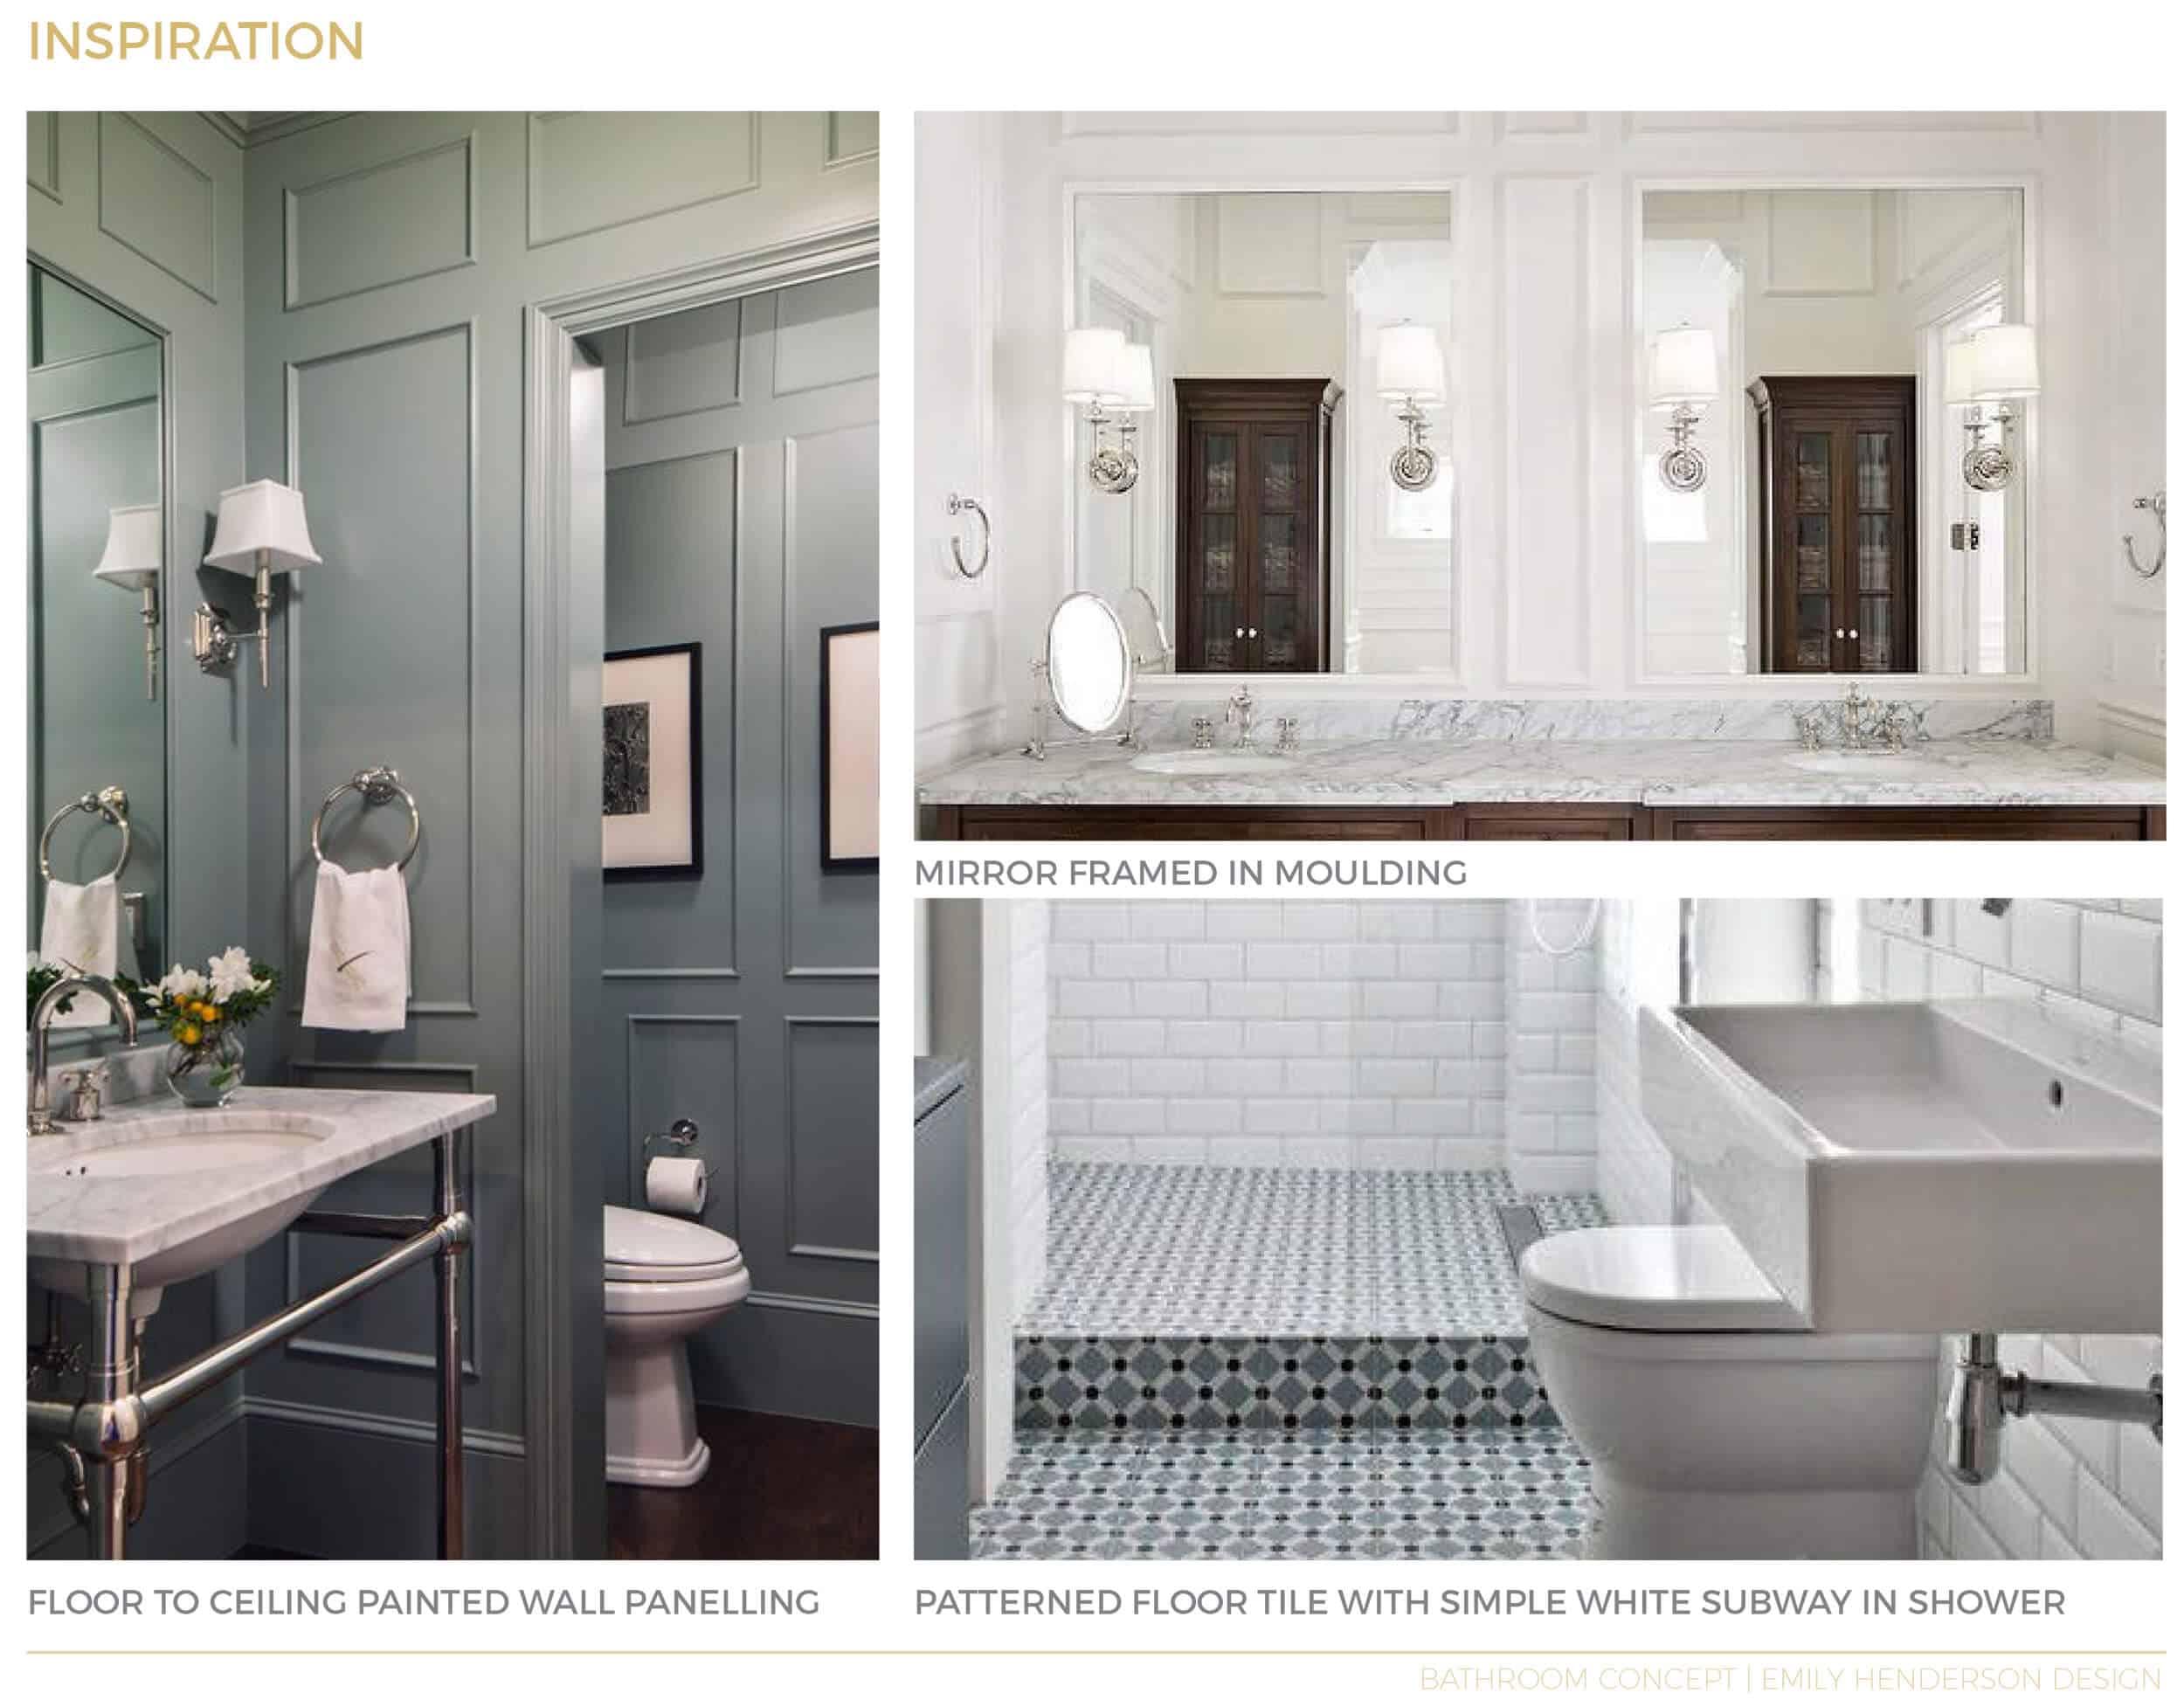 Emily-Henderson_Silver-Lake-Hills-Home_Master-Bathroom_Intro_Inspiration